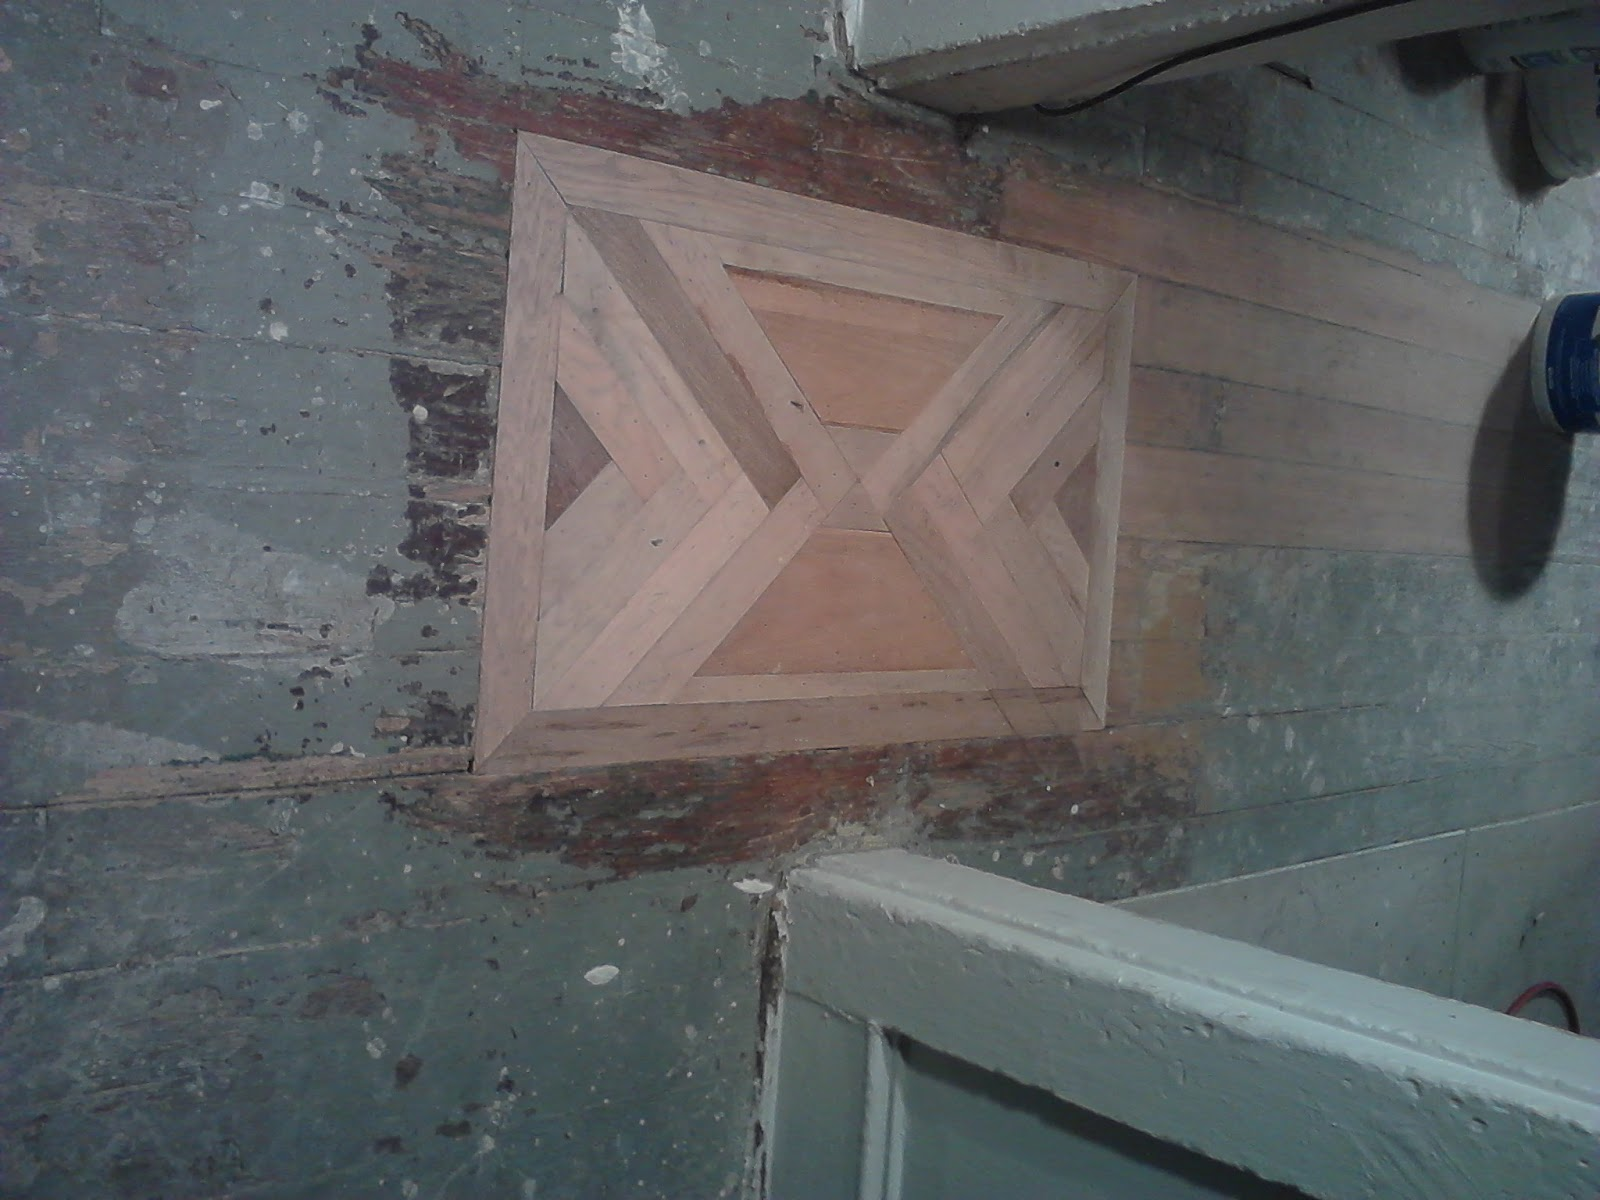 Custom Flooring Patch-http://stlouisrenewableenergy.blogspot.com/2013/01/benton-rehab-flooring-custom-floor-patch.html